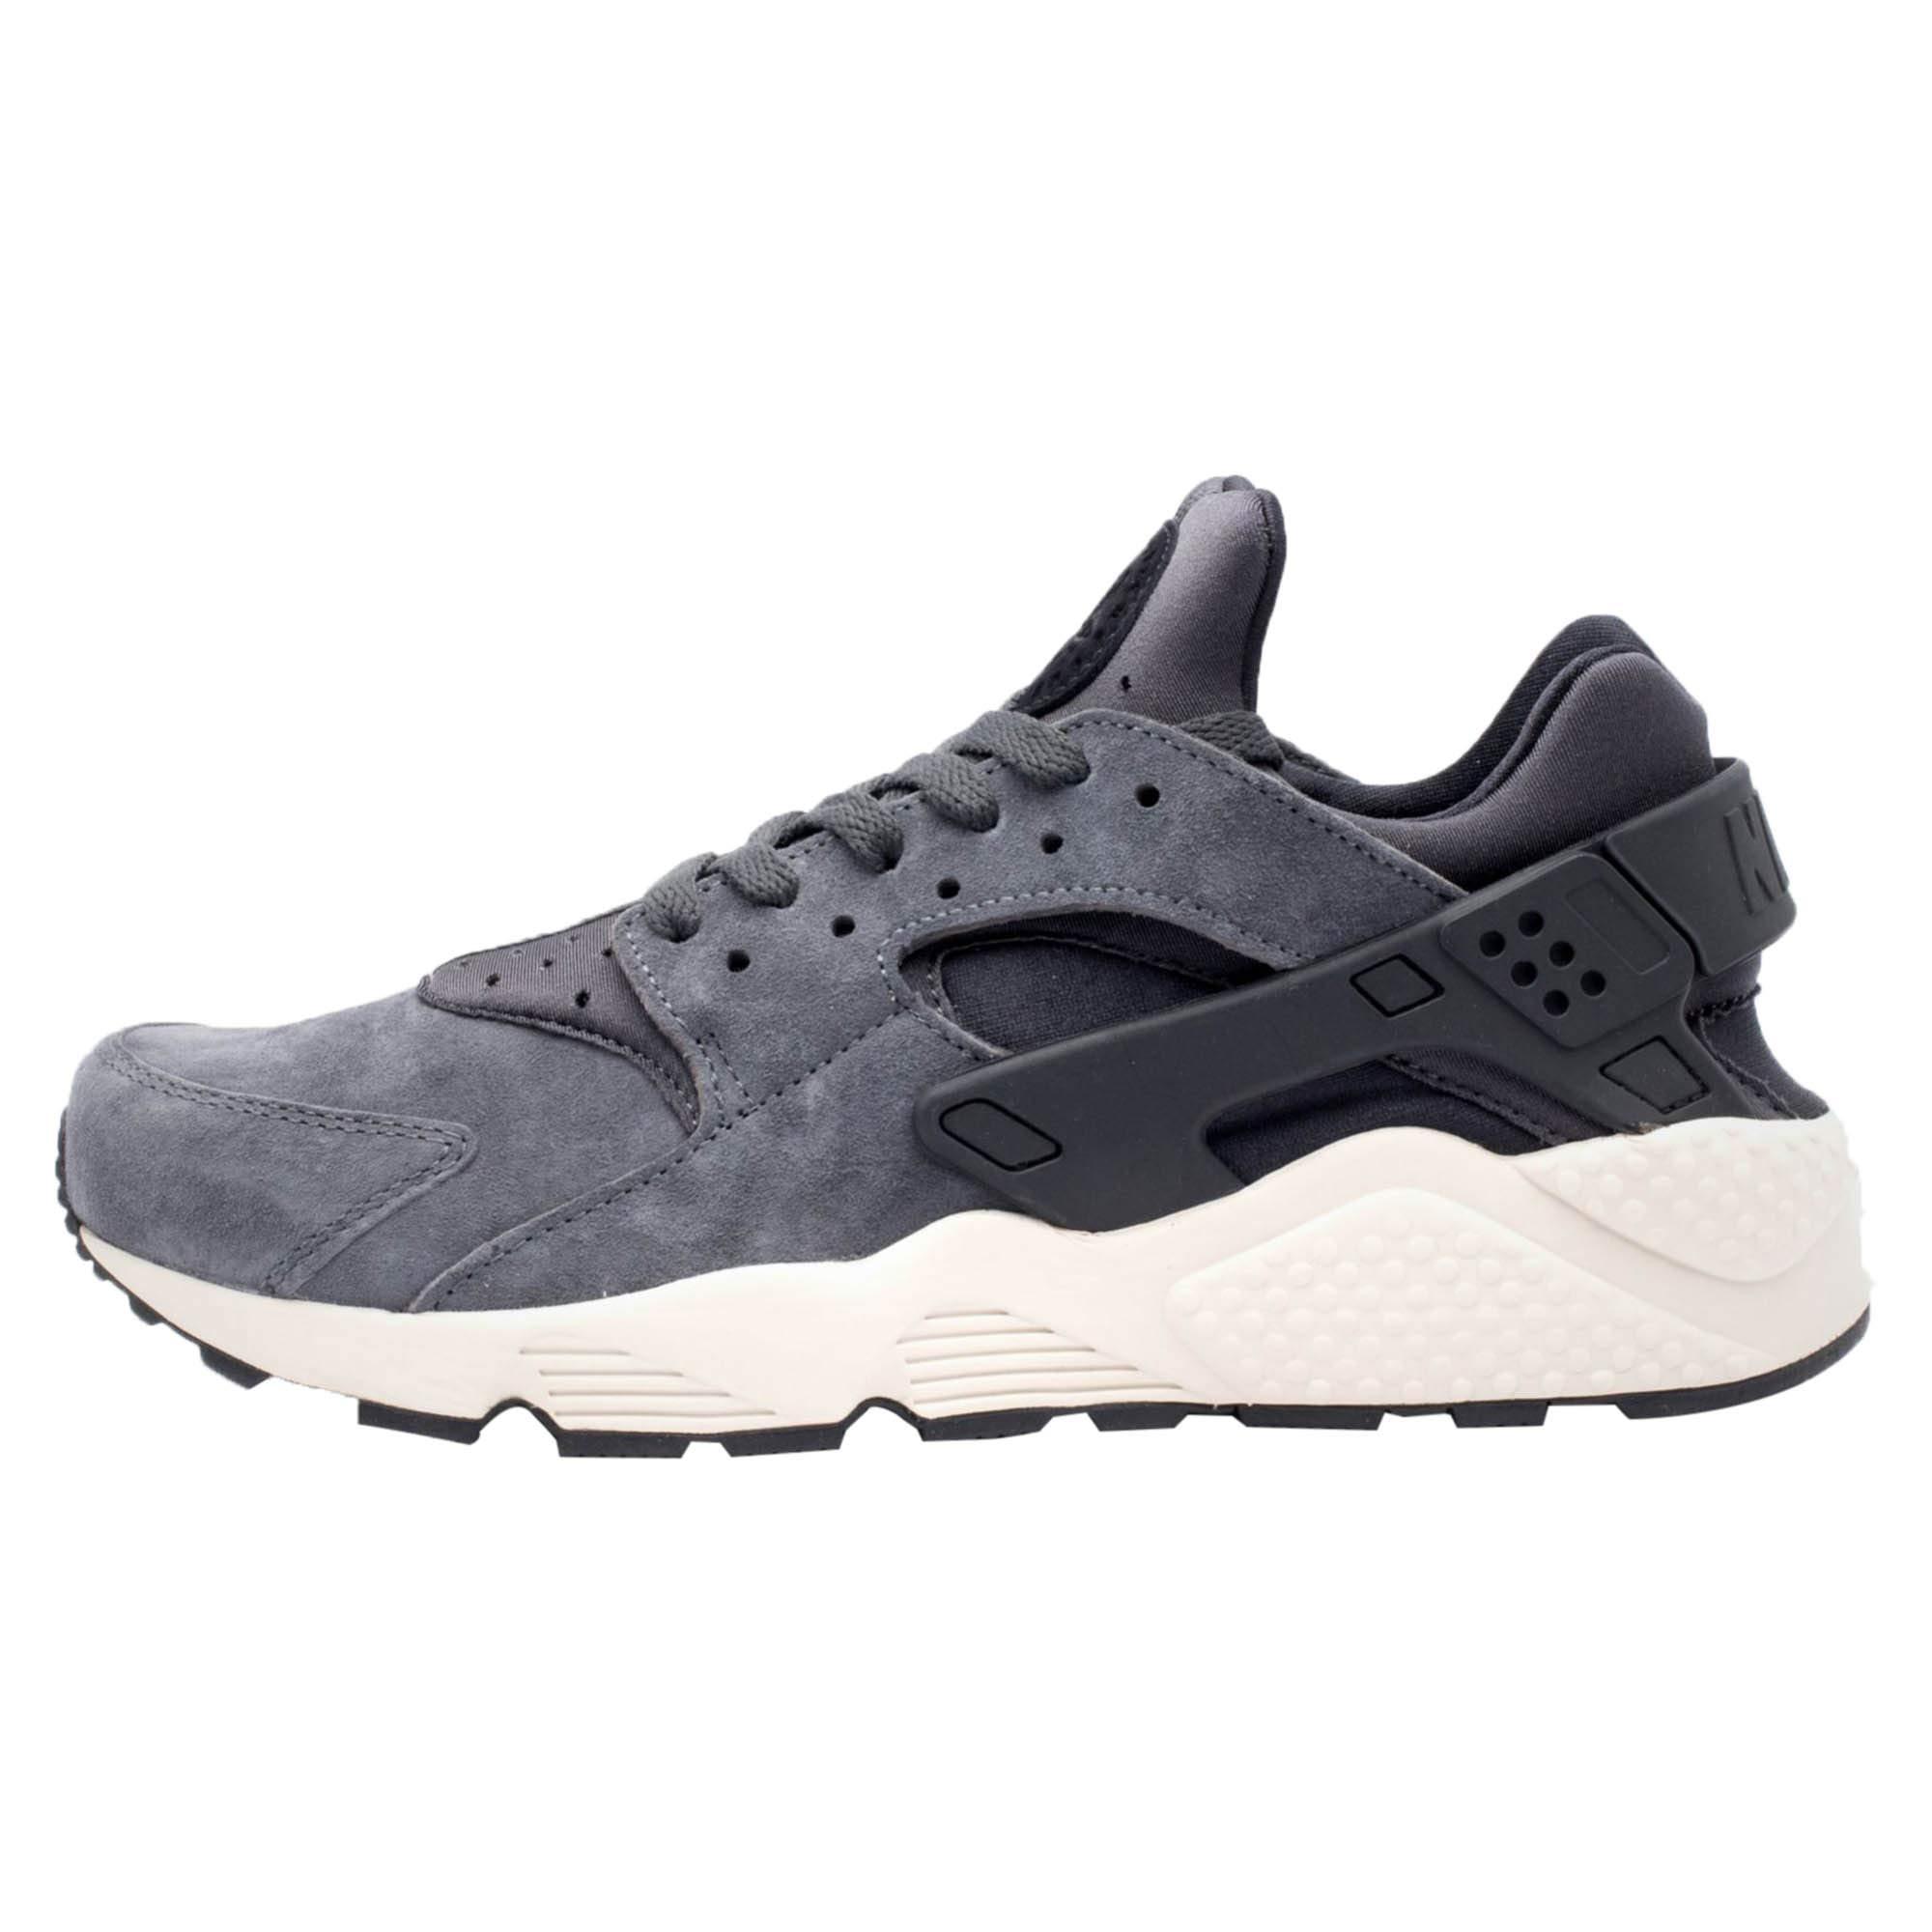 huge discount 2c249 1109c Galleon - Nike Air Huarache Run PRM Mens Style   704830-016 Size   13 M US